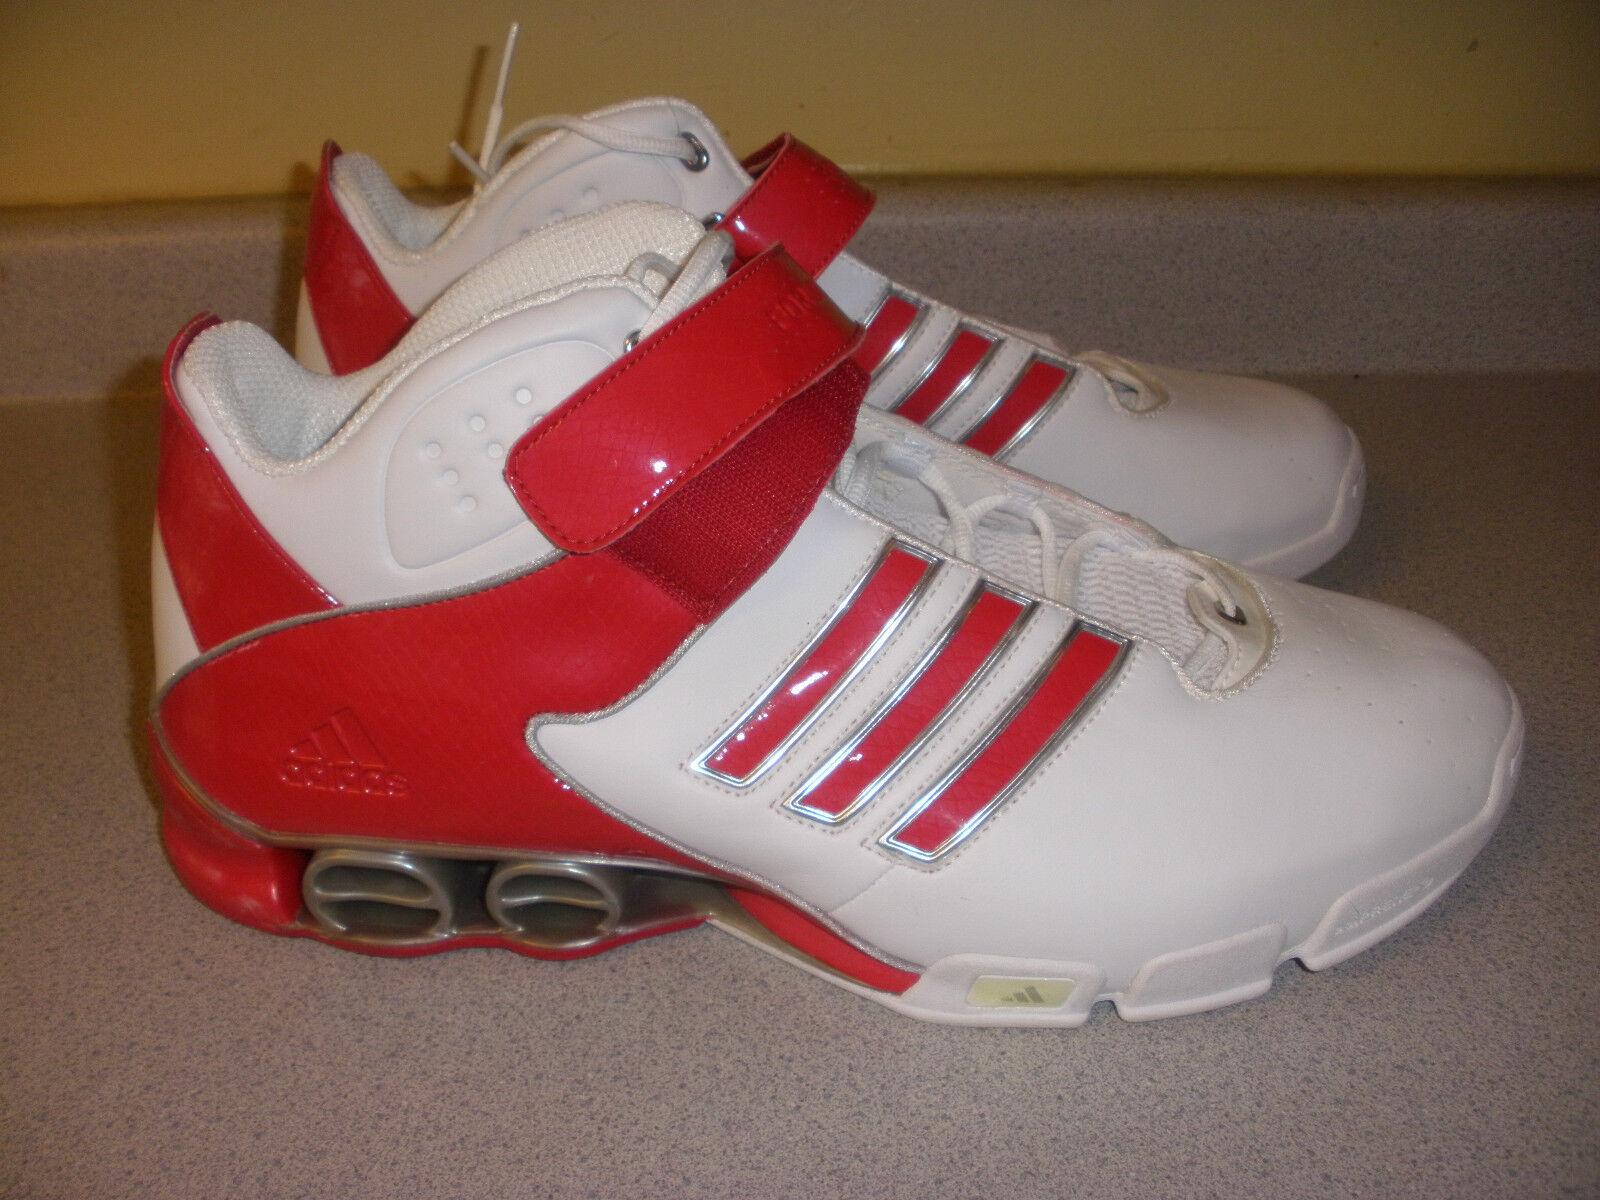 SAMPLE 809289 Men's Adidas Freemont Mid Originals Size 16 RED WHITE